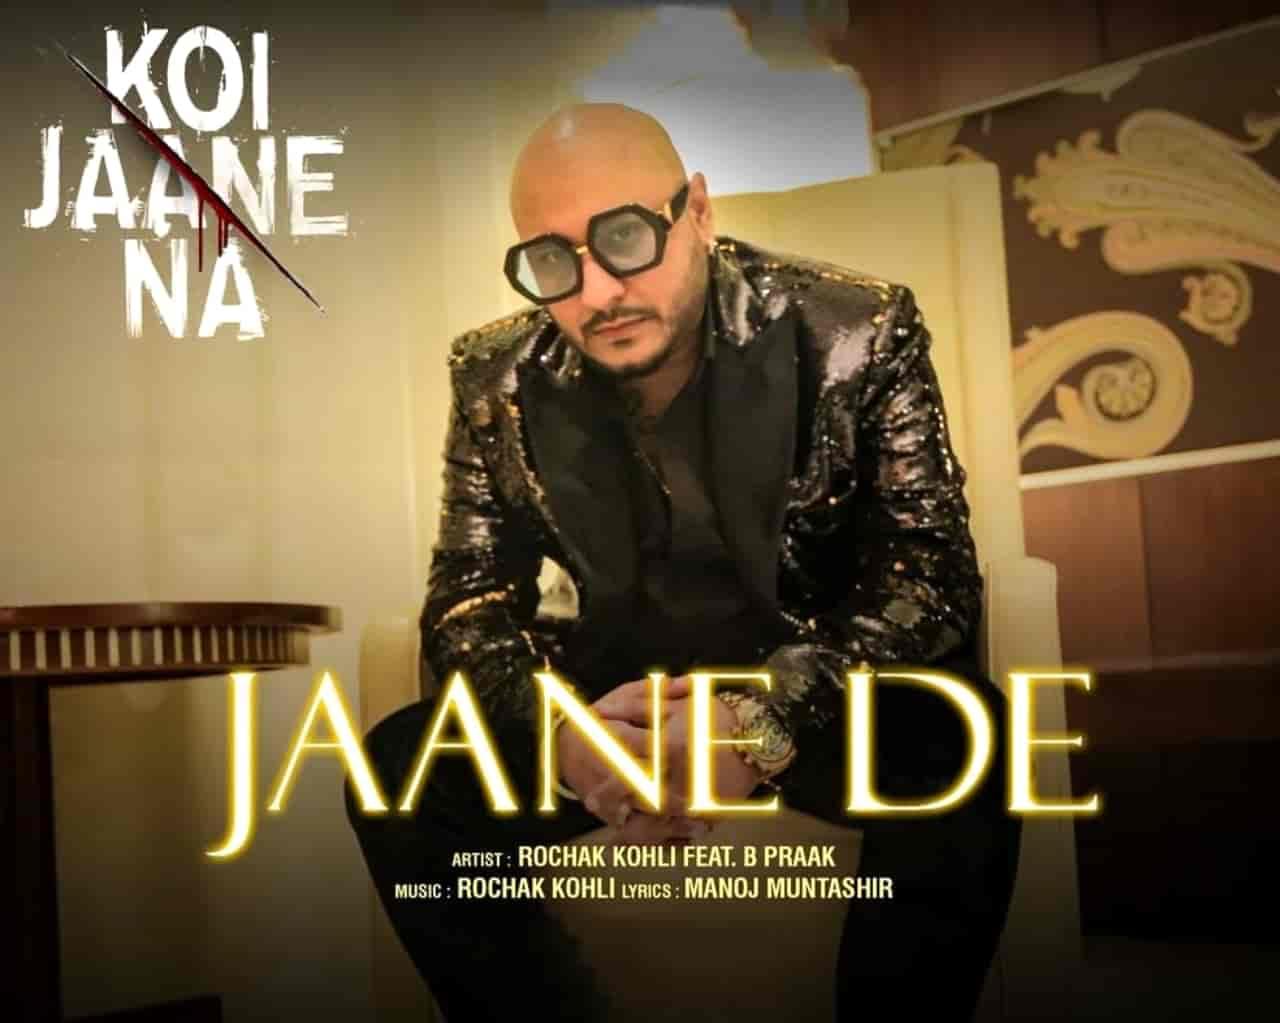 Jaane De Hindi Song Lyrics B Praak